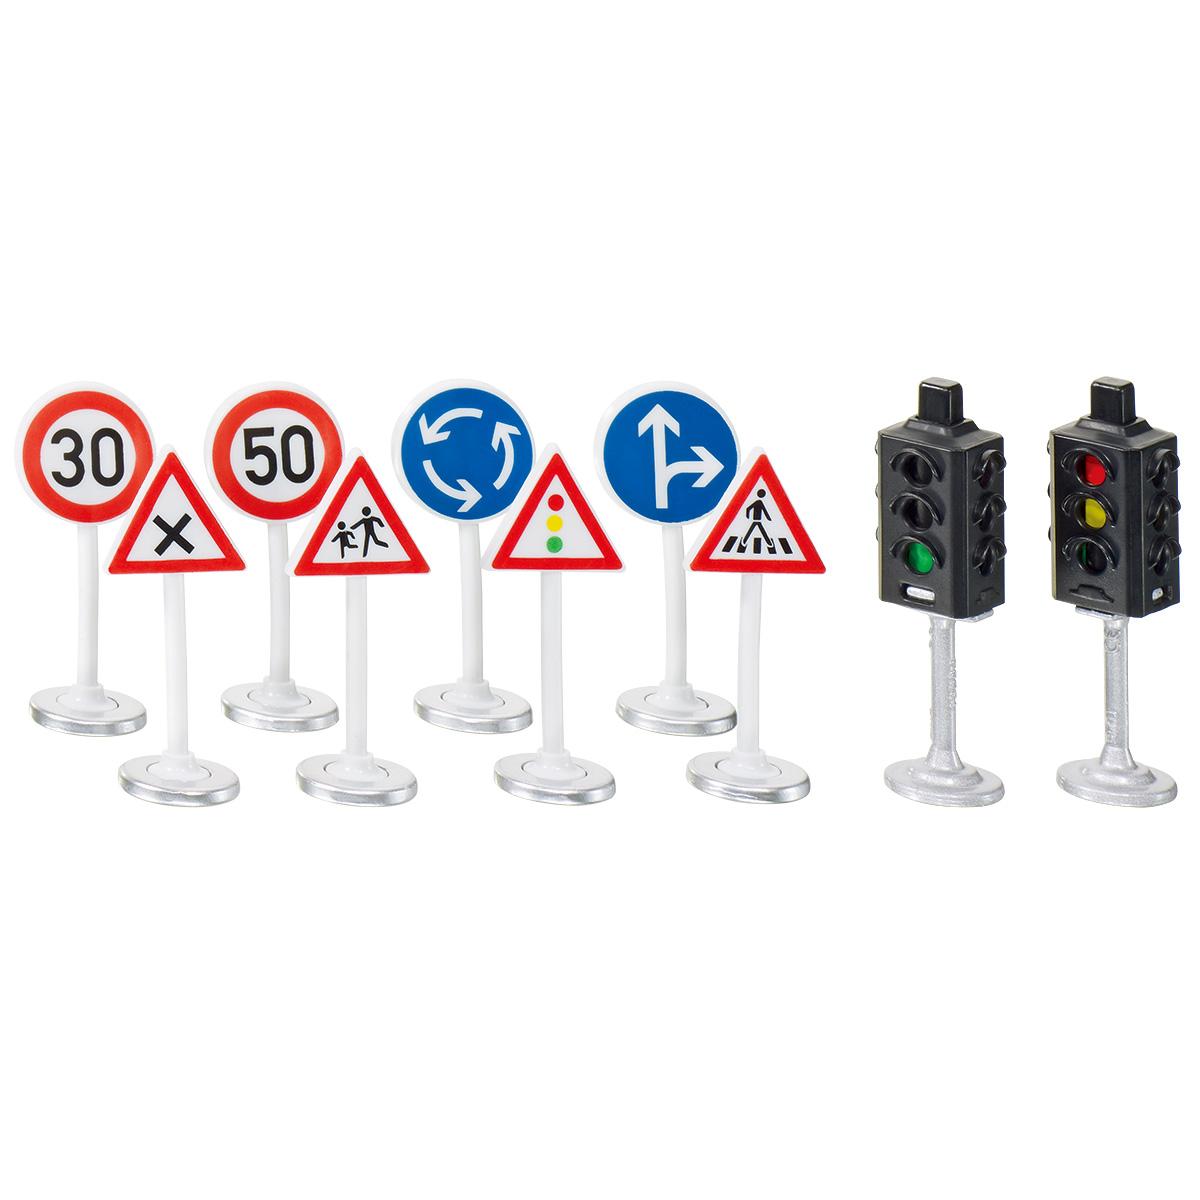 SIKU WORLD用アクセサリー 信号機・道路標識セット